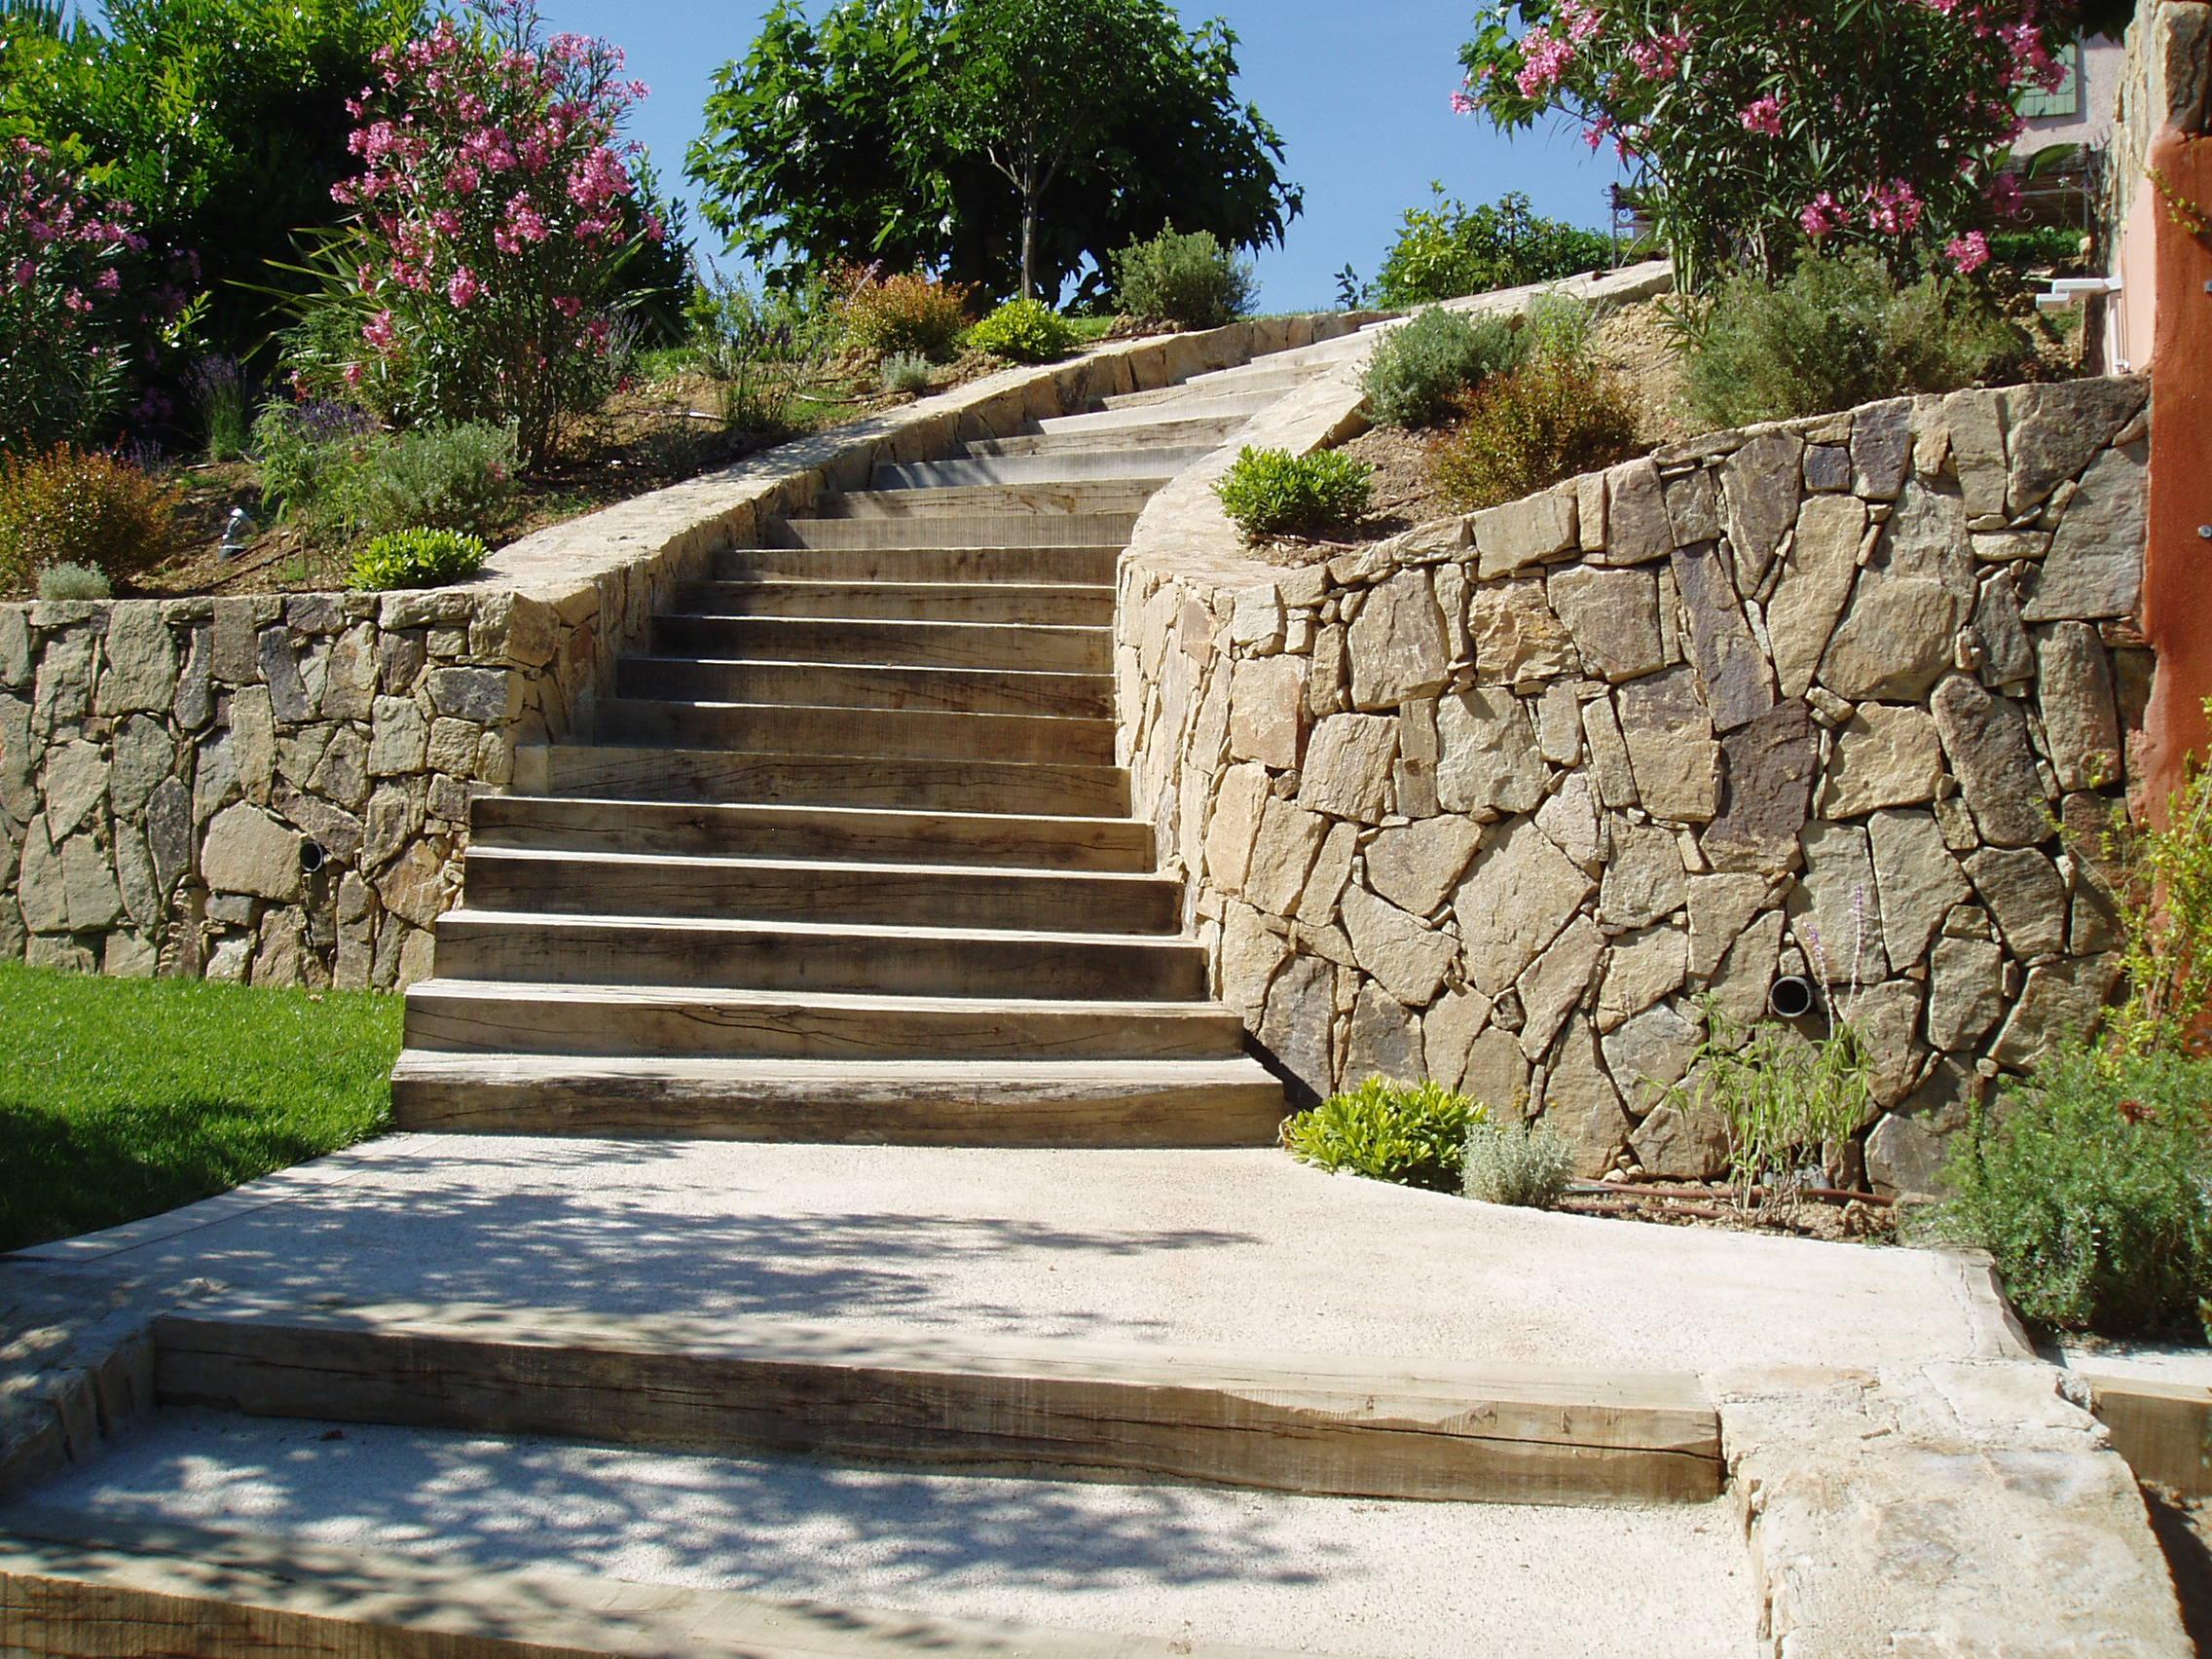 escalier en traverses de chemin de fer r alisation woodstone project. Black Bedroom Furniture Sets. Home Design Ideas